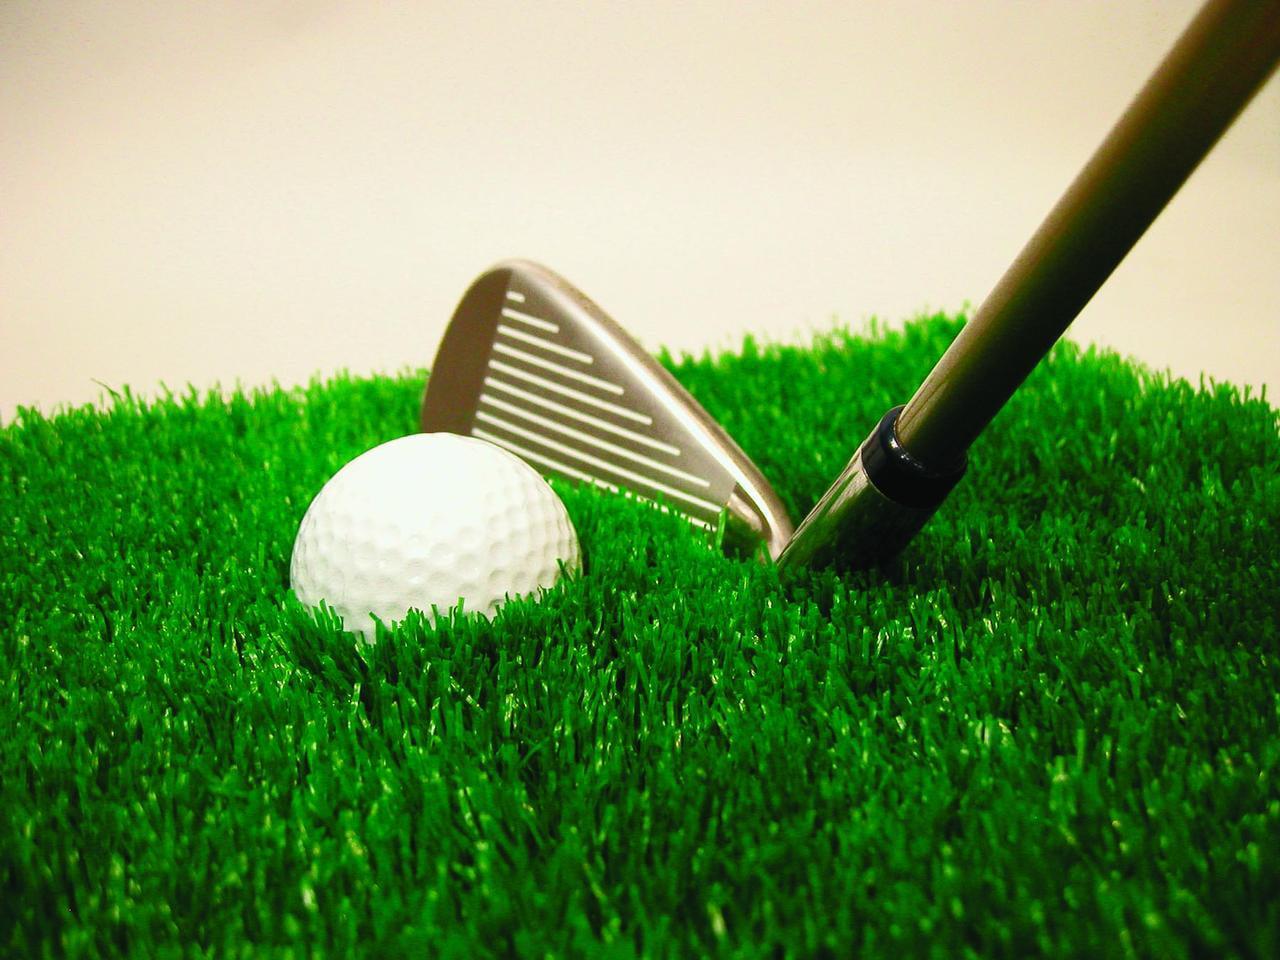 practice buy x hitting callaway driving mat golf chipping mats series pro durapro